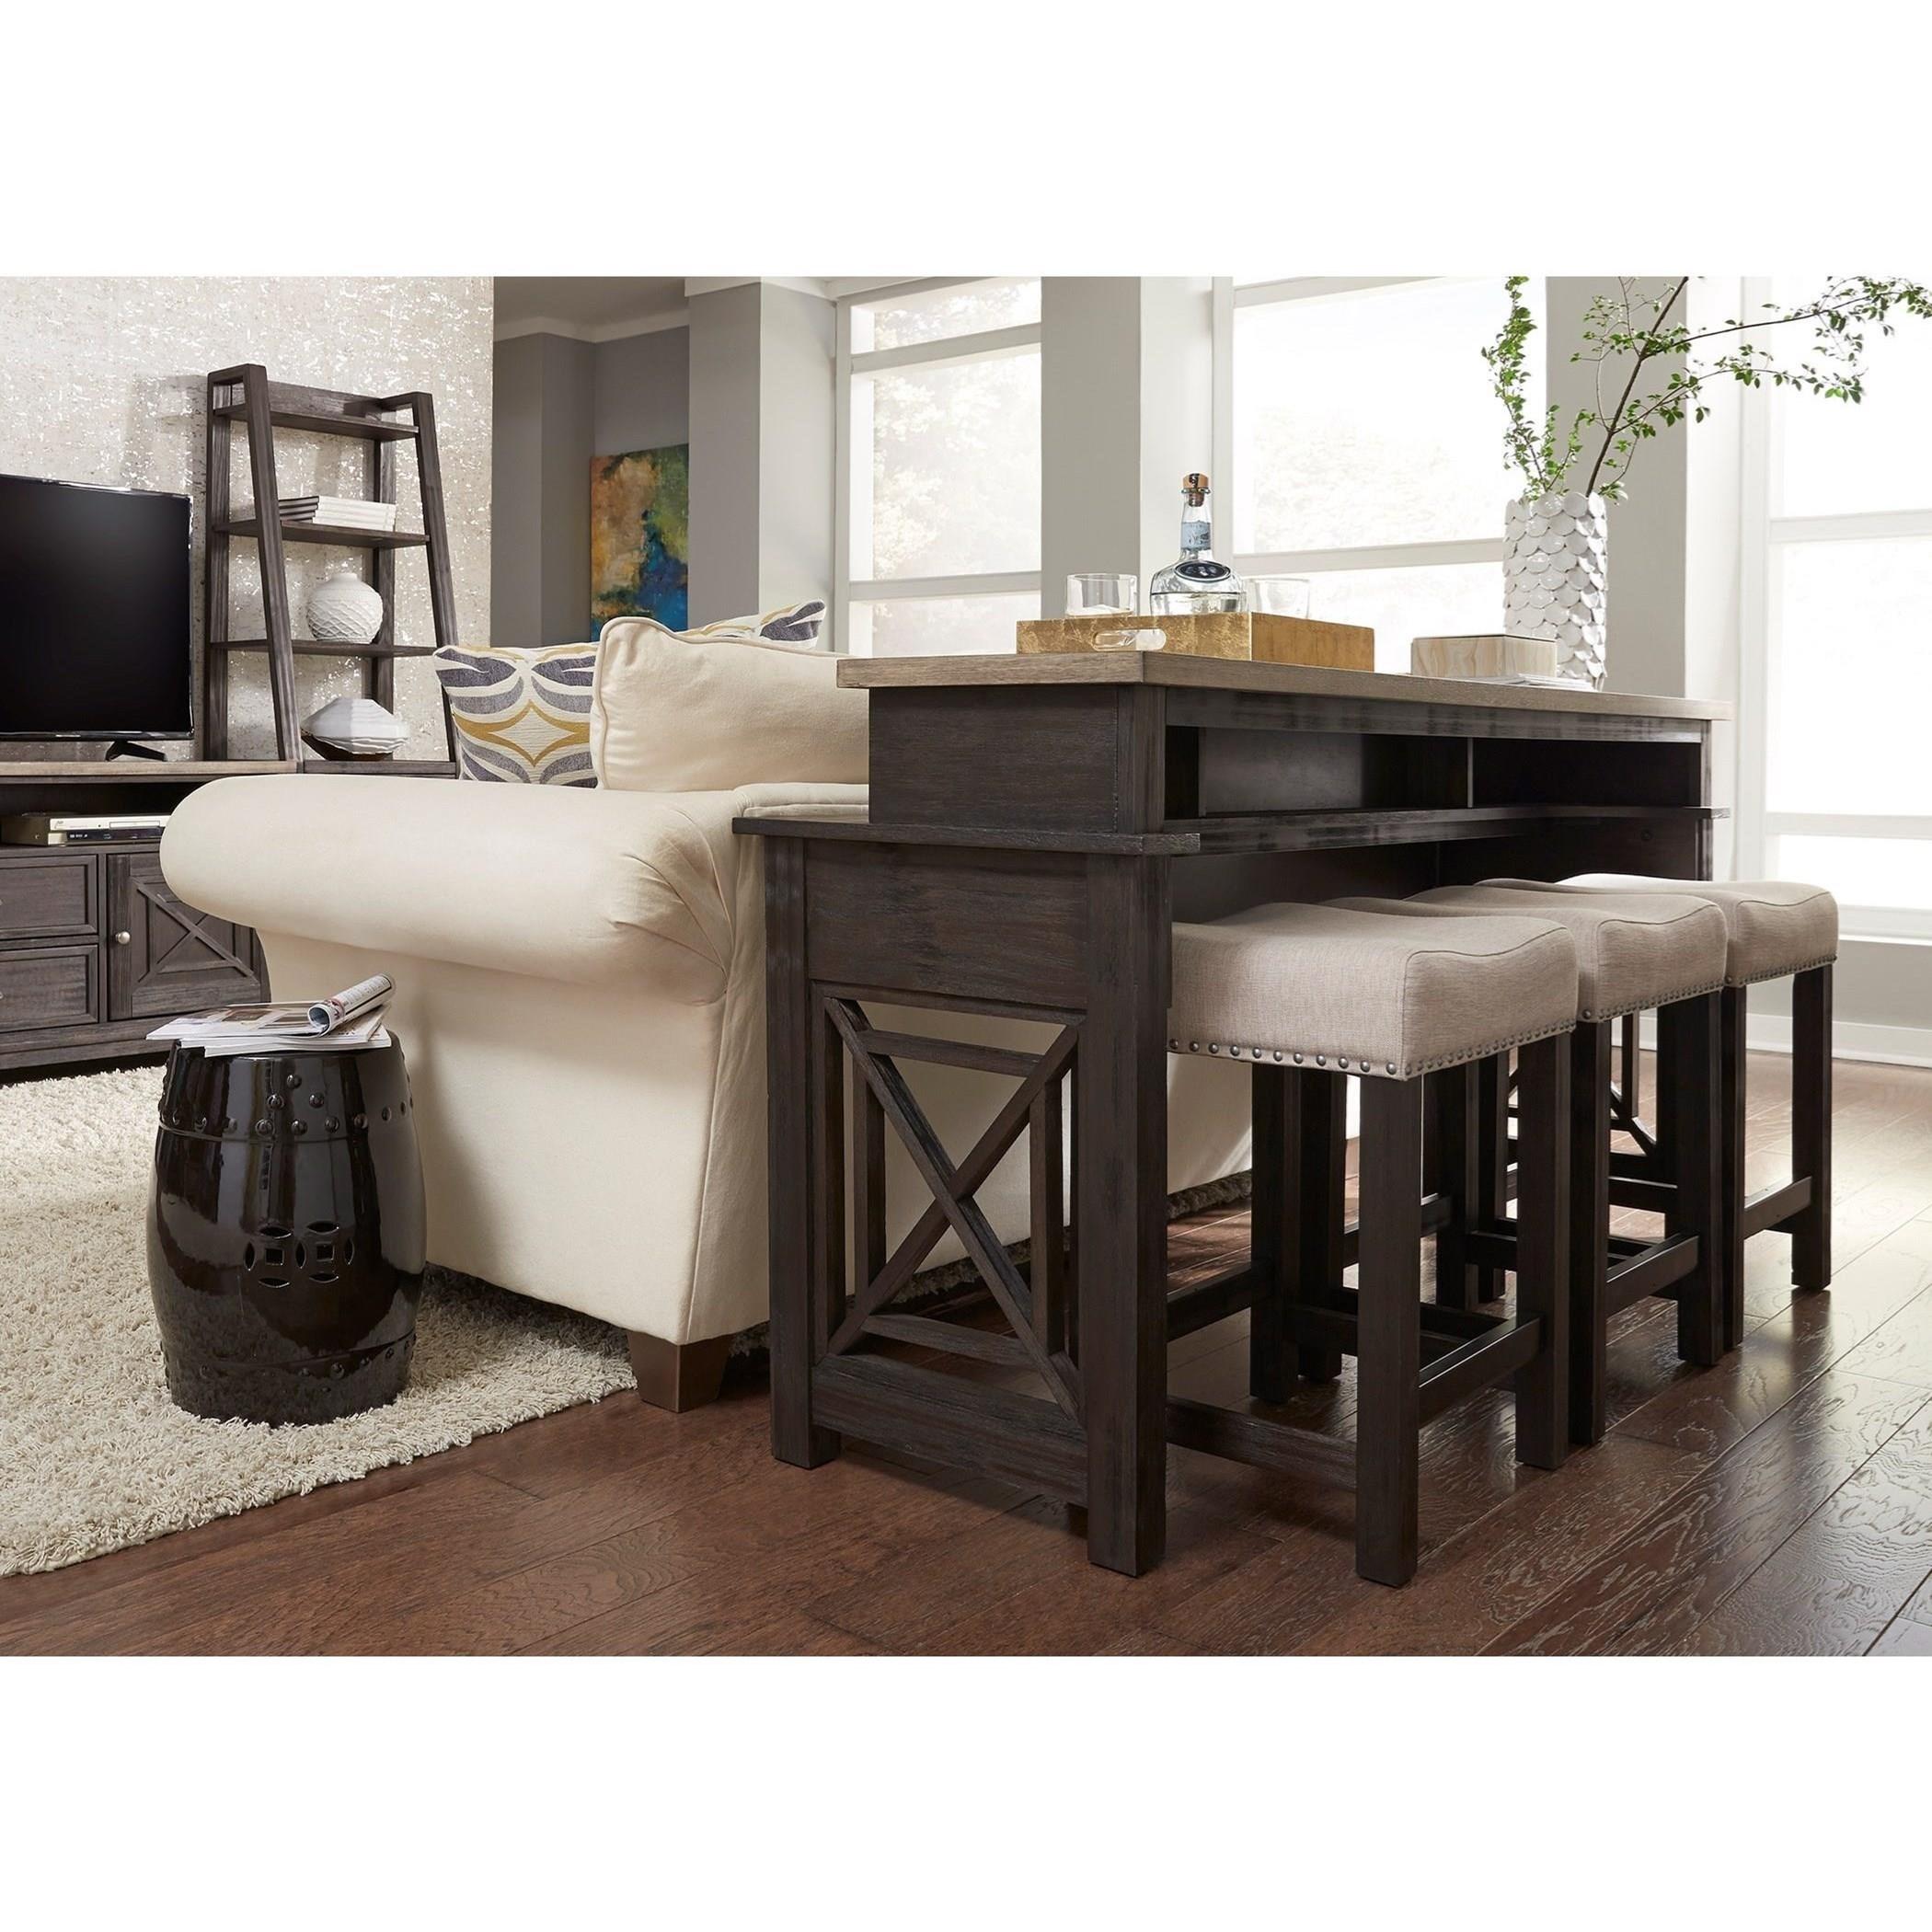 Liberty furniture heatherbrook occasional console bar